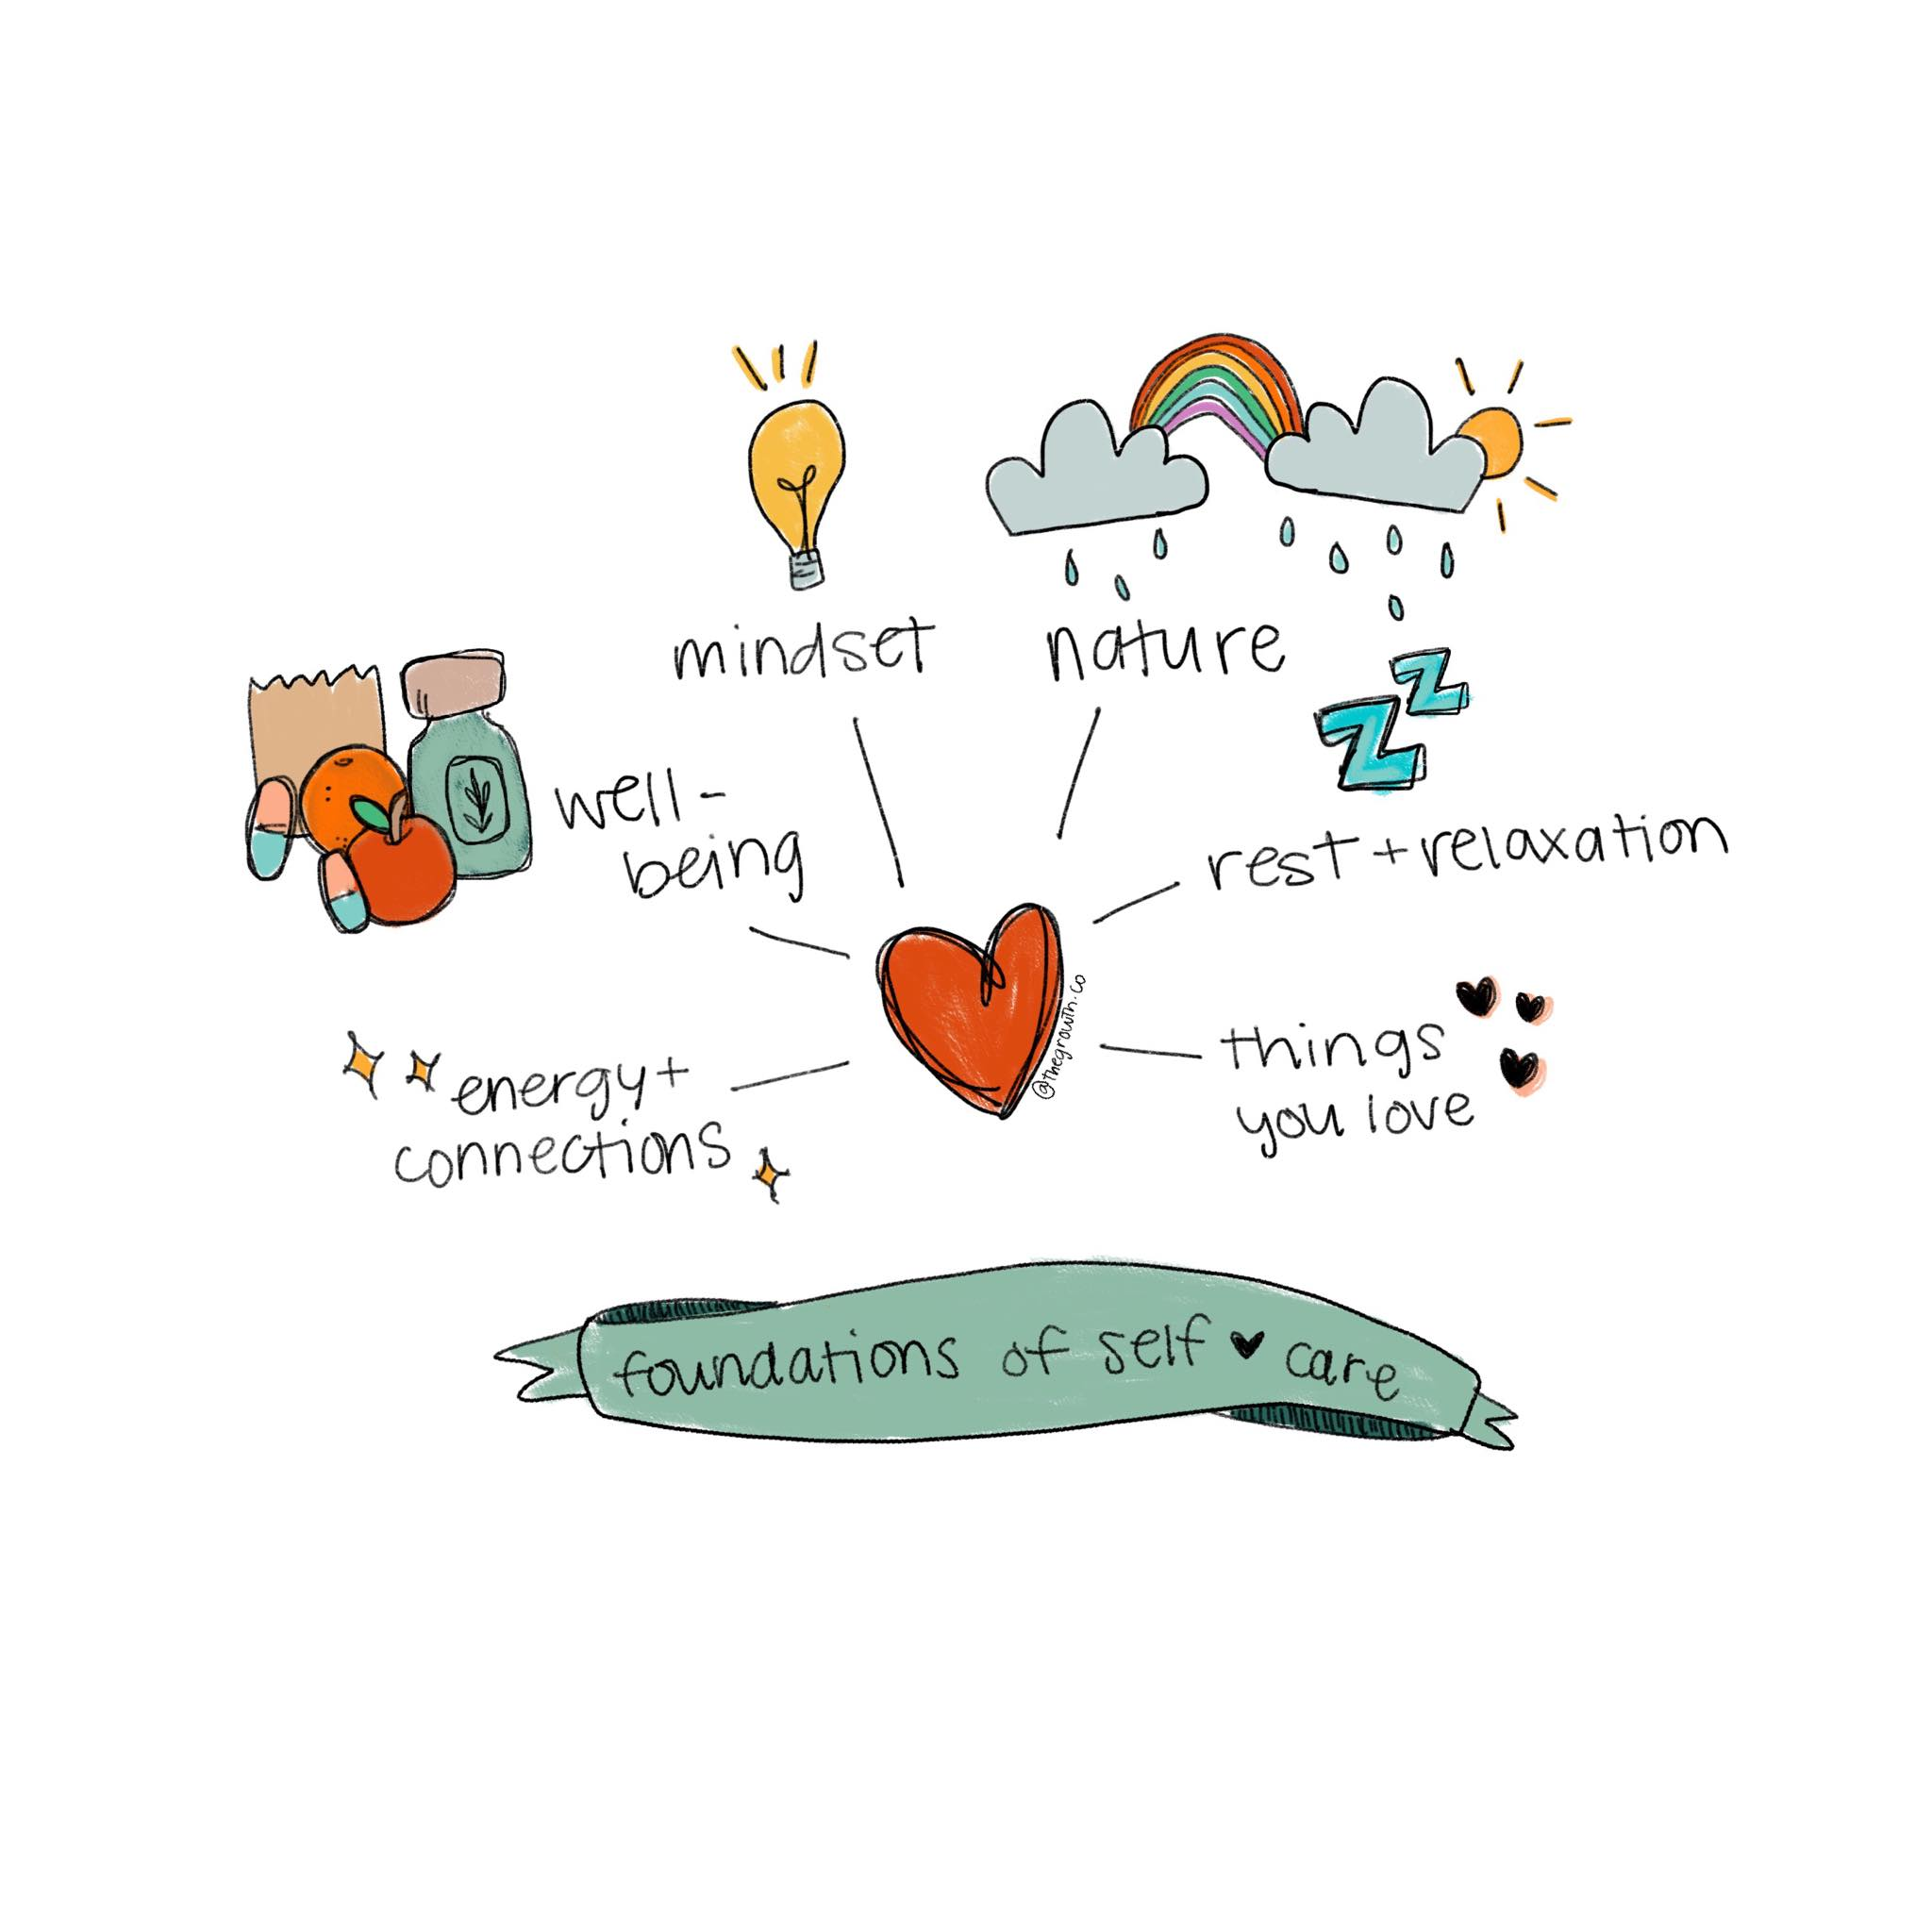 foundations of self care.jpg